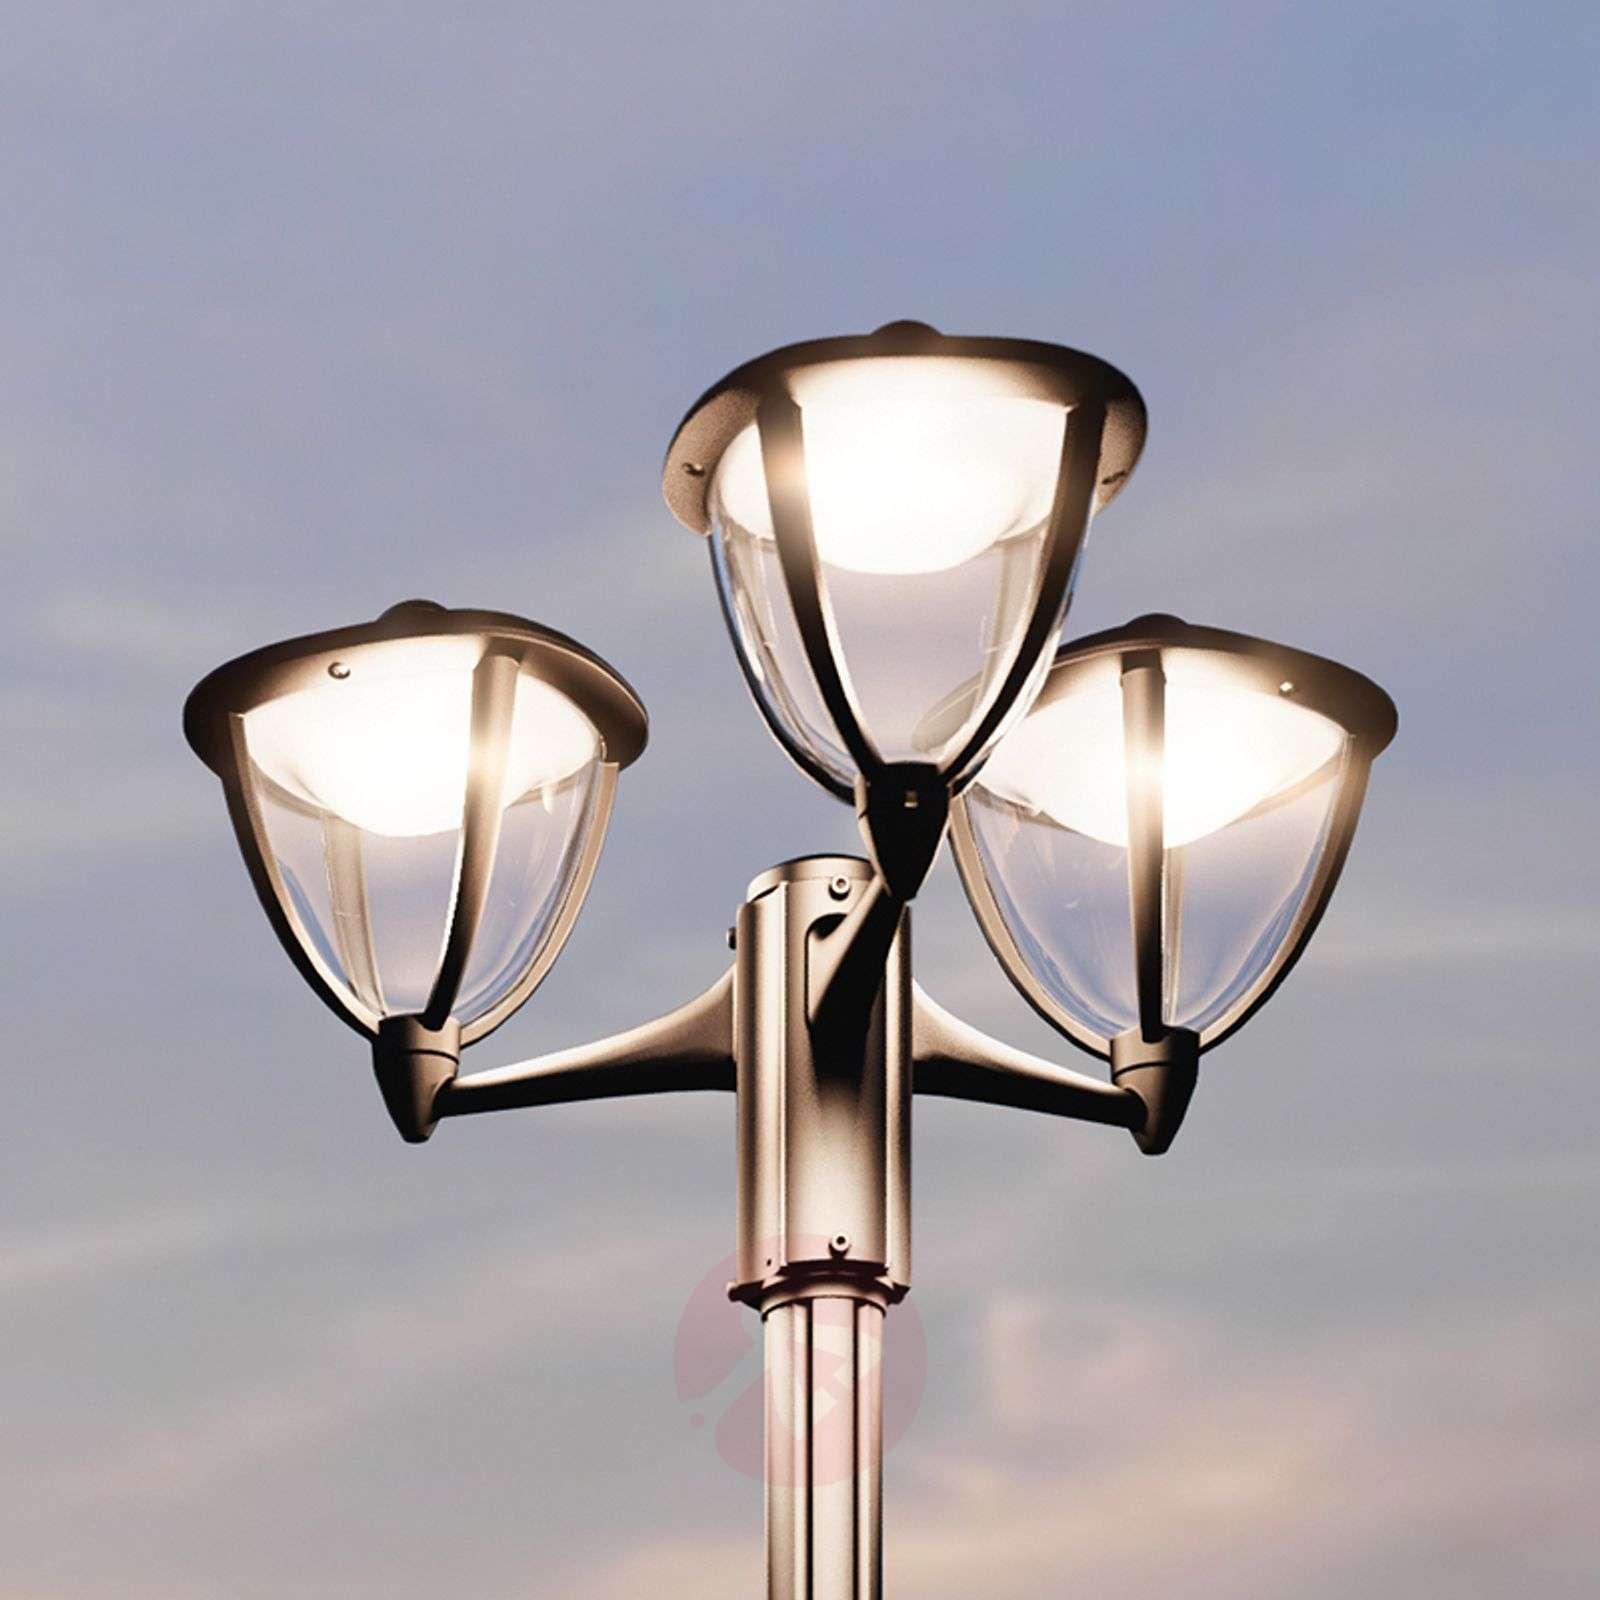 3 bulb led post light robin lights 3 bulb led post light robin 7531781 01 aloadofball Choice Image